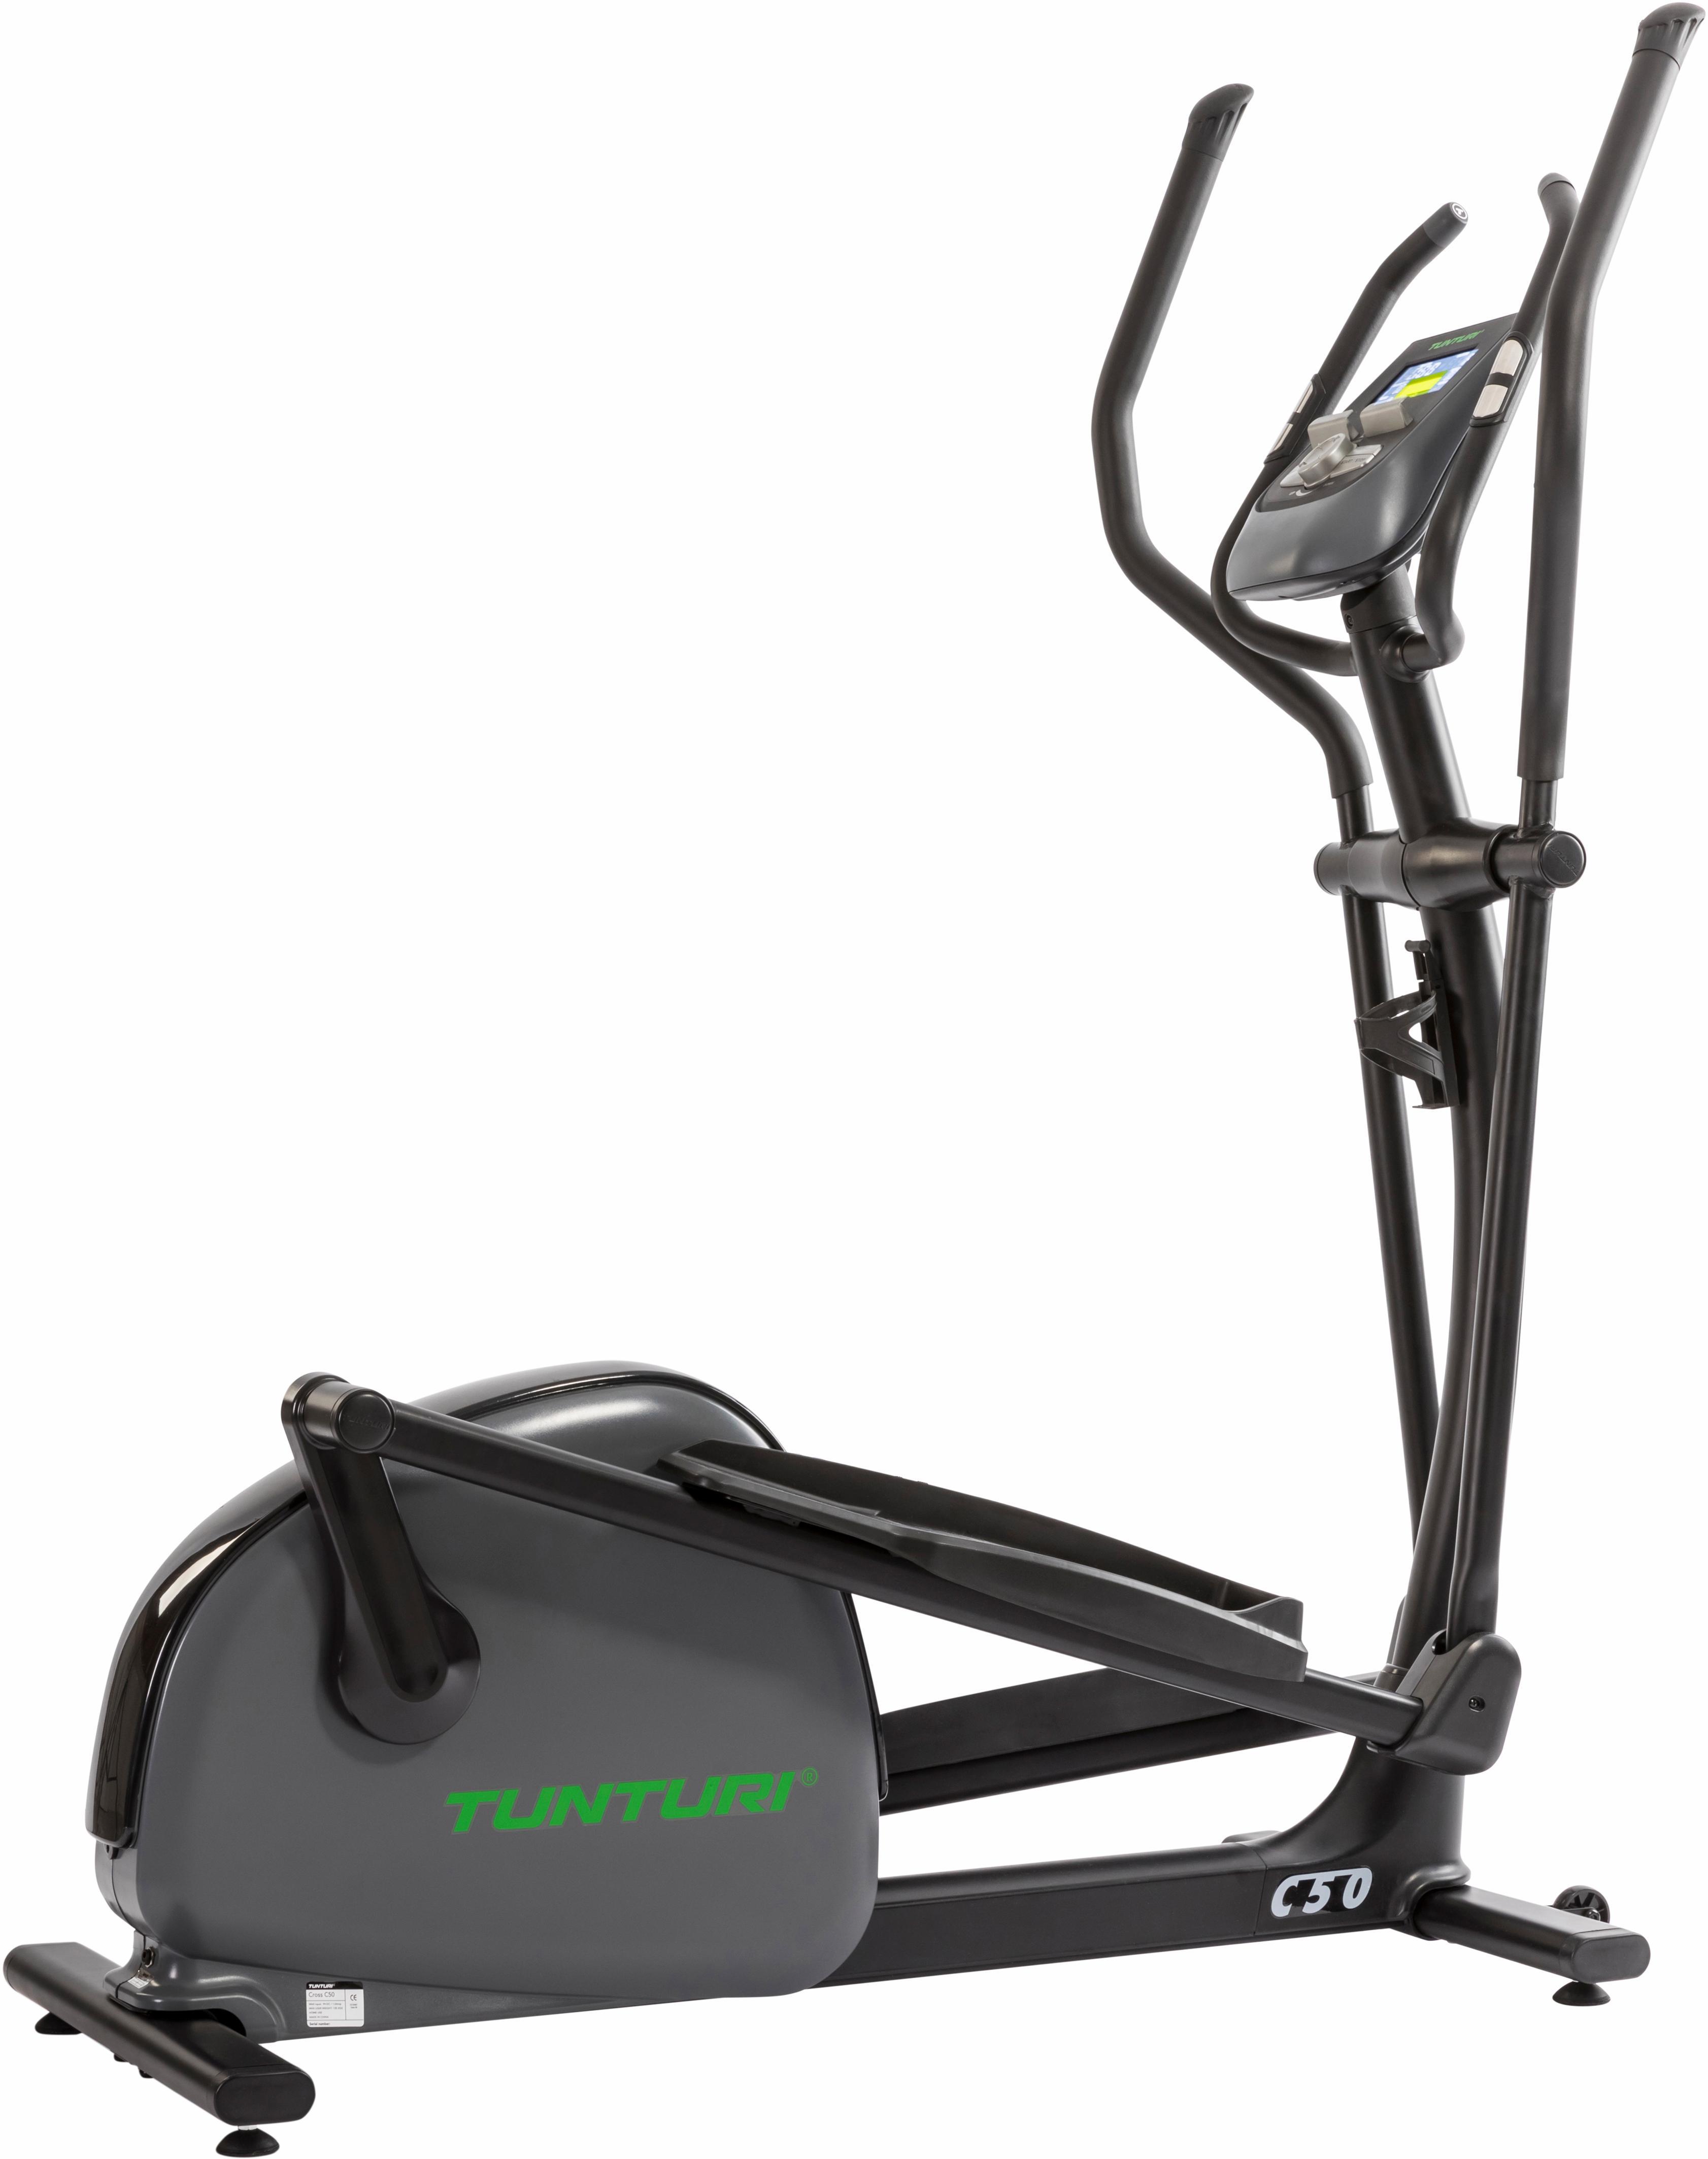 Tunturi Crosstrainer,  C50-R Crosstrainer Performance  Preisvergleich